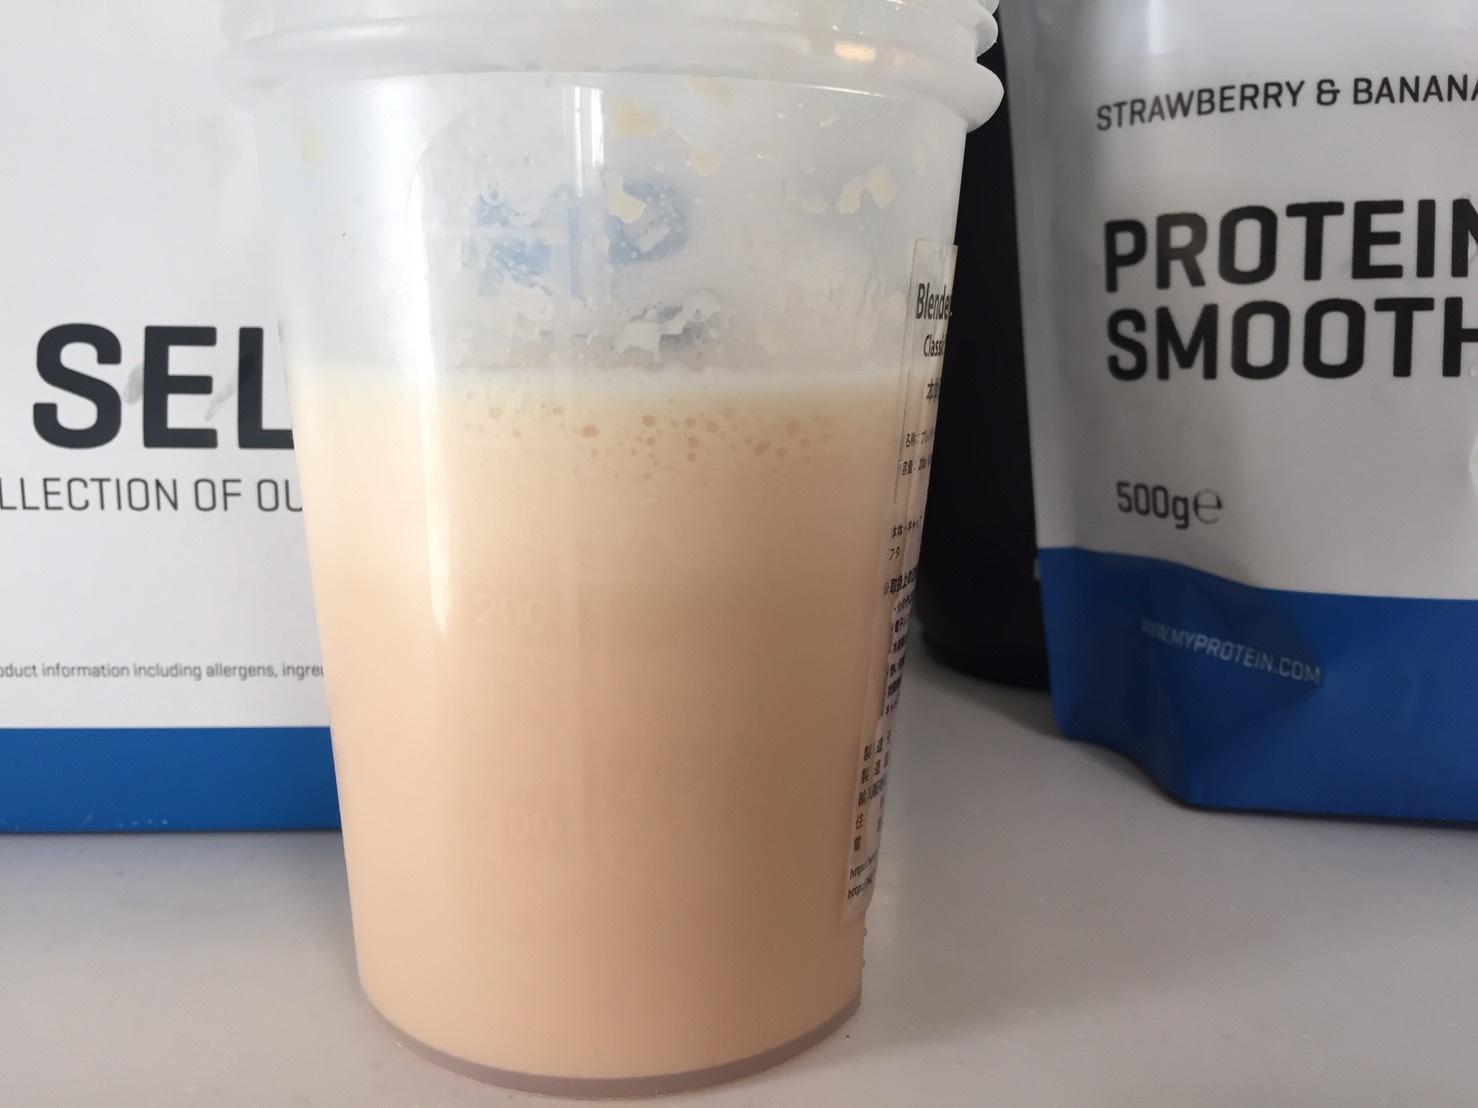 Protein Smoothie(プロテイン・スムージー)「STRAWBERRY & BANANA FLAVOUR(ストロベリー&バナナ味)」を横から撮影した様子